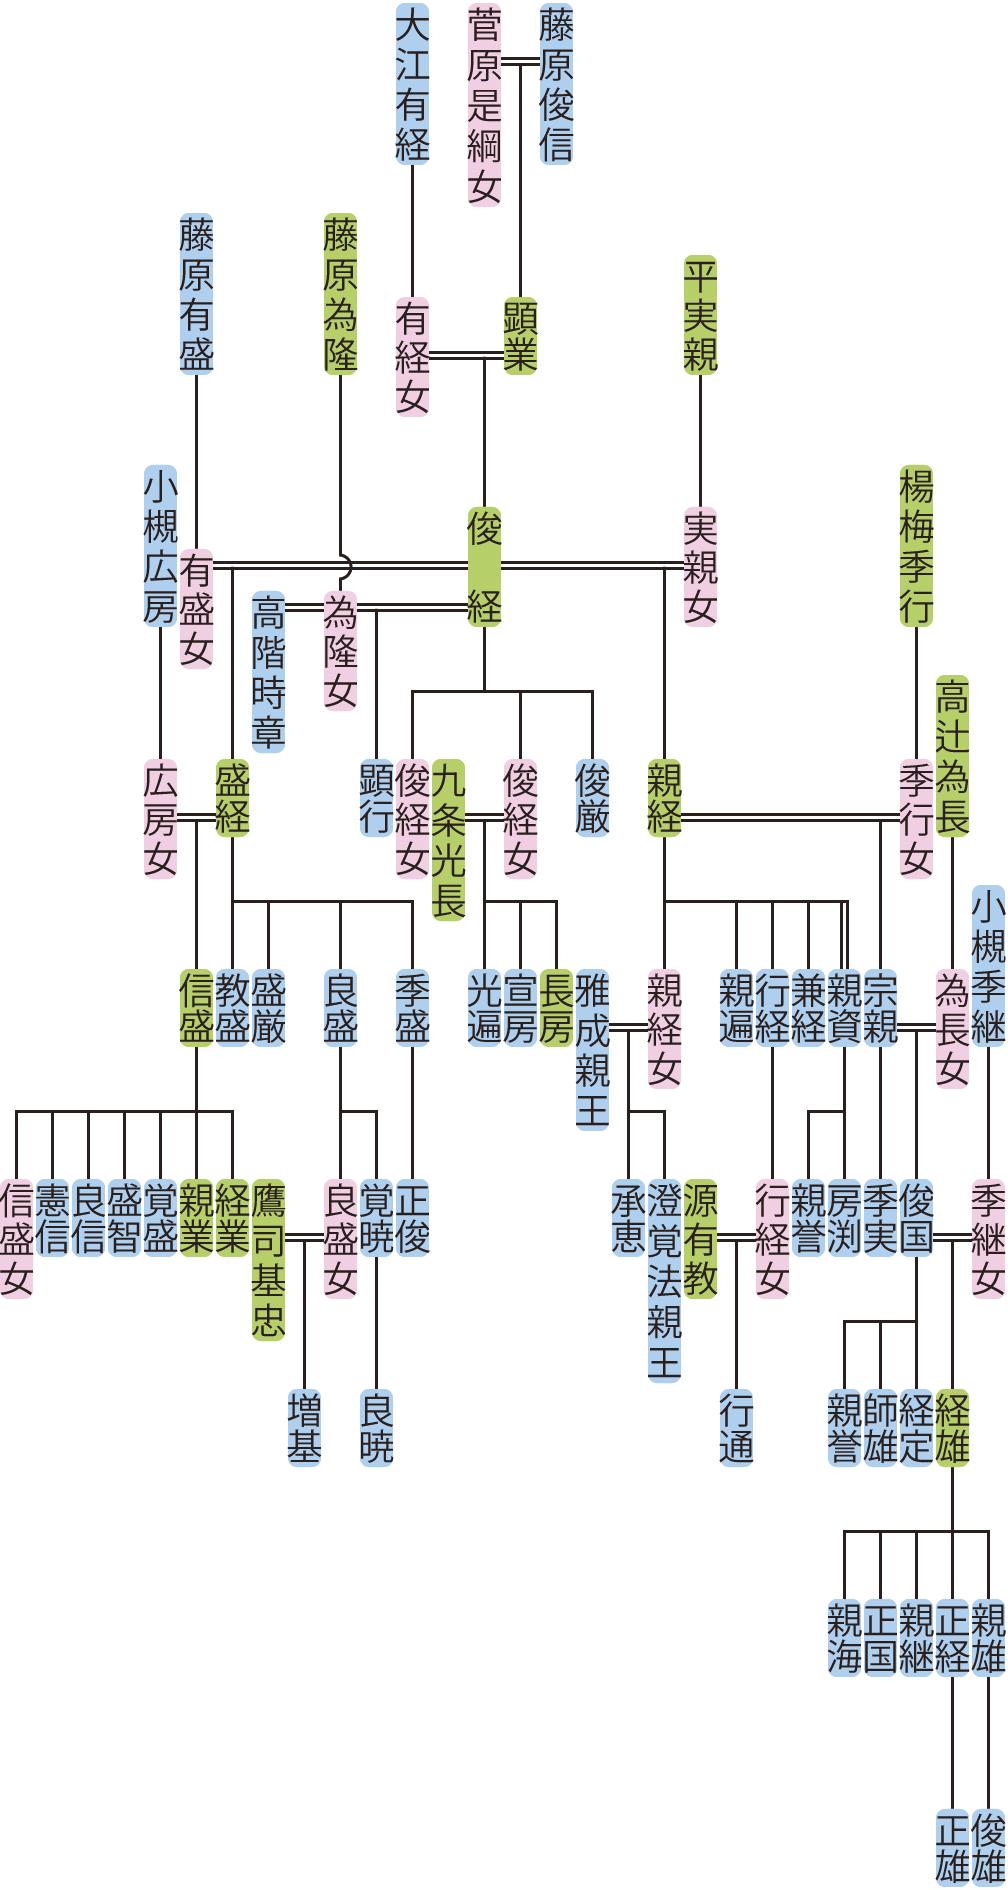 藤原俊経・盛経の系図